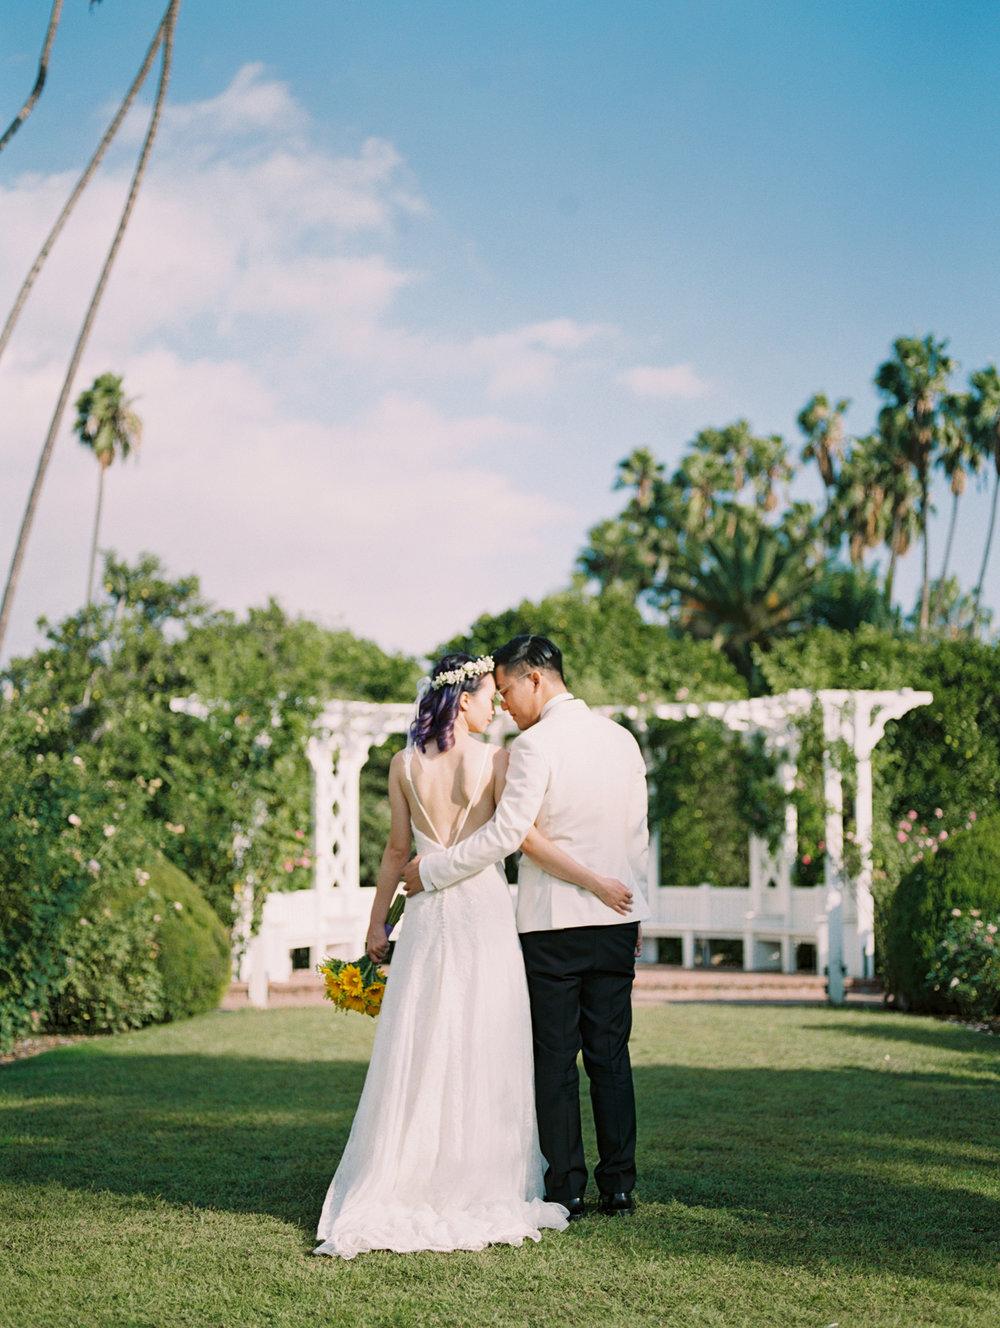 los-angeles-county-arboretum-and-botanic-garden-wedding-photos-photography262.jpg